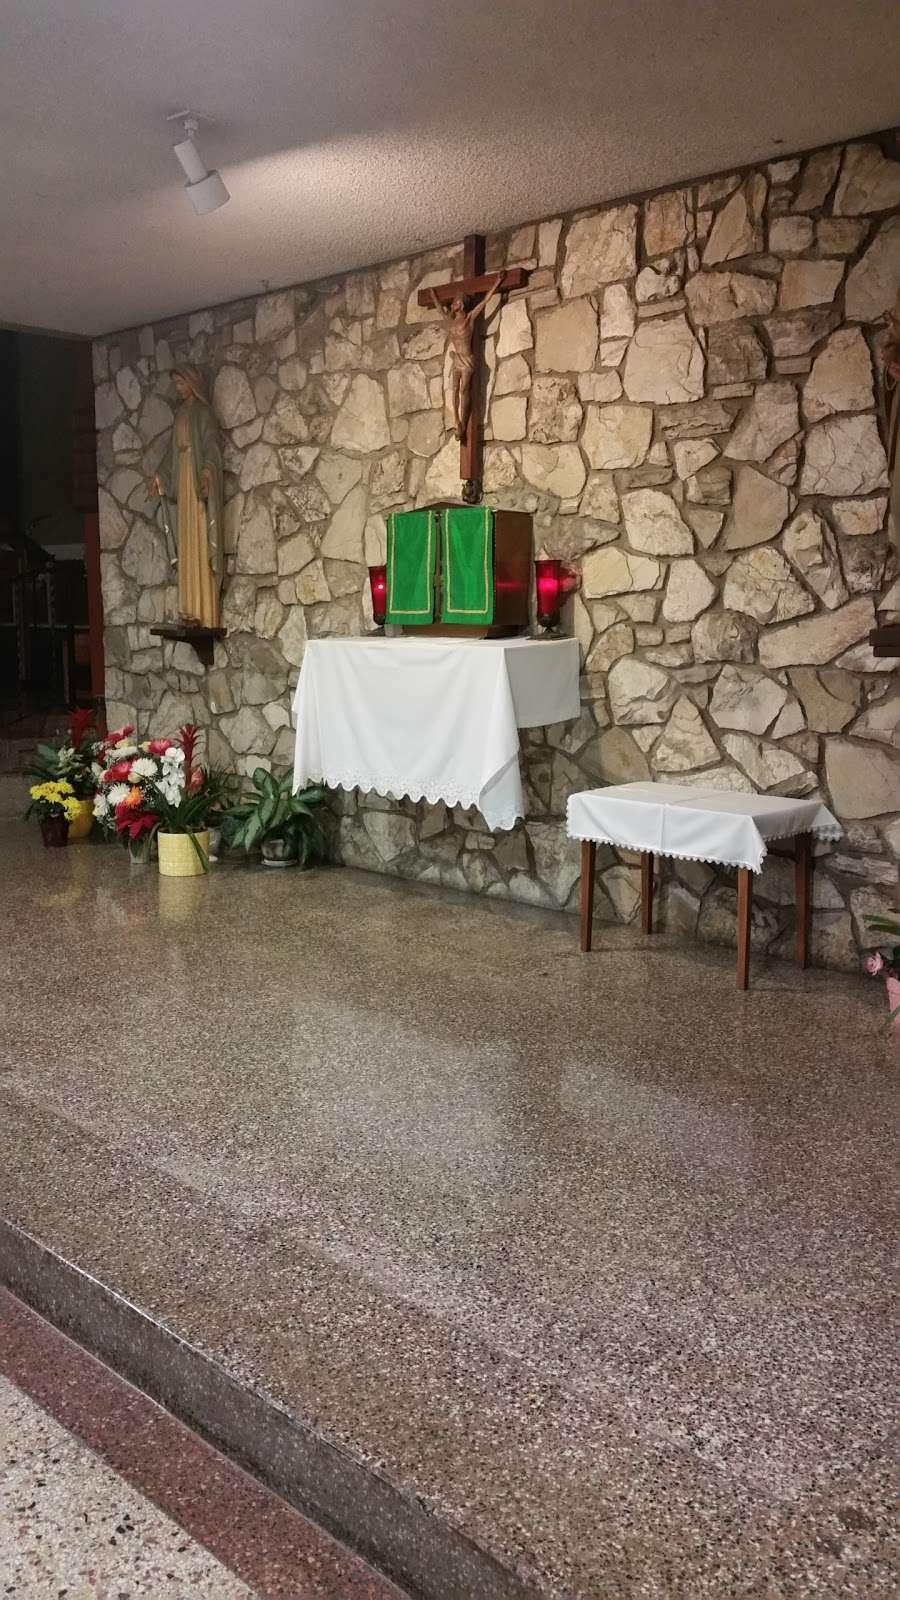 St. Catherine Laboure Church - church  | Photo 2 of 10 | Address: 3846 Redondo Beach Blvd, Torrance, CA 90504, USA | Phone: (310) 323-8900